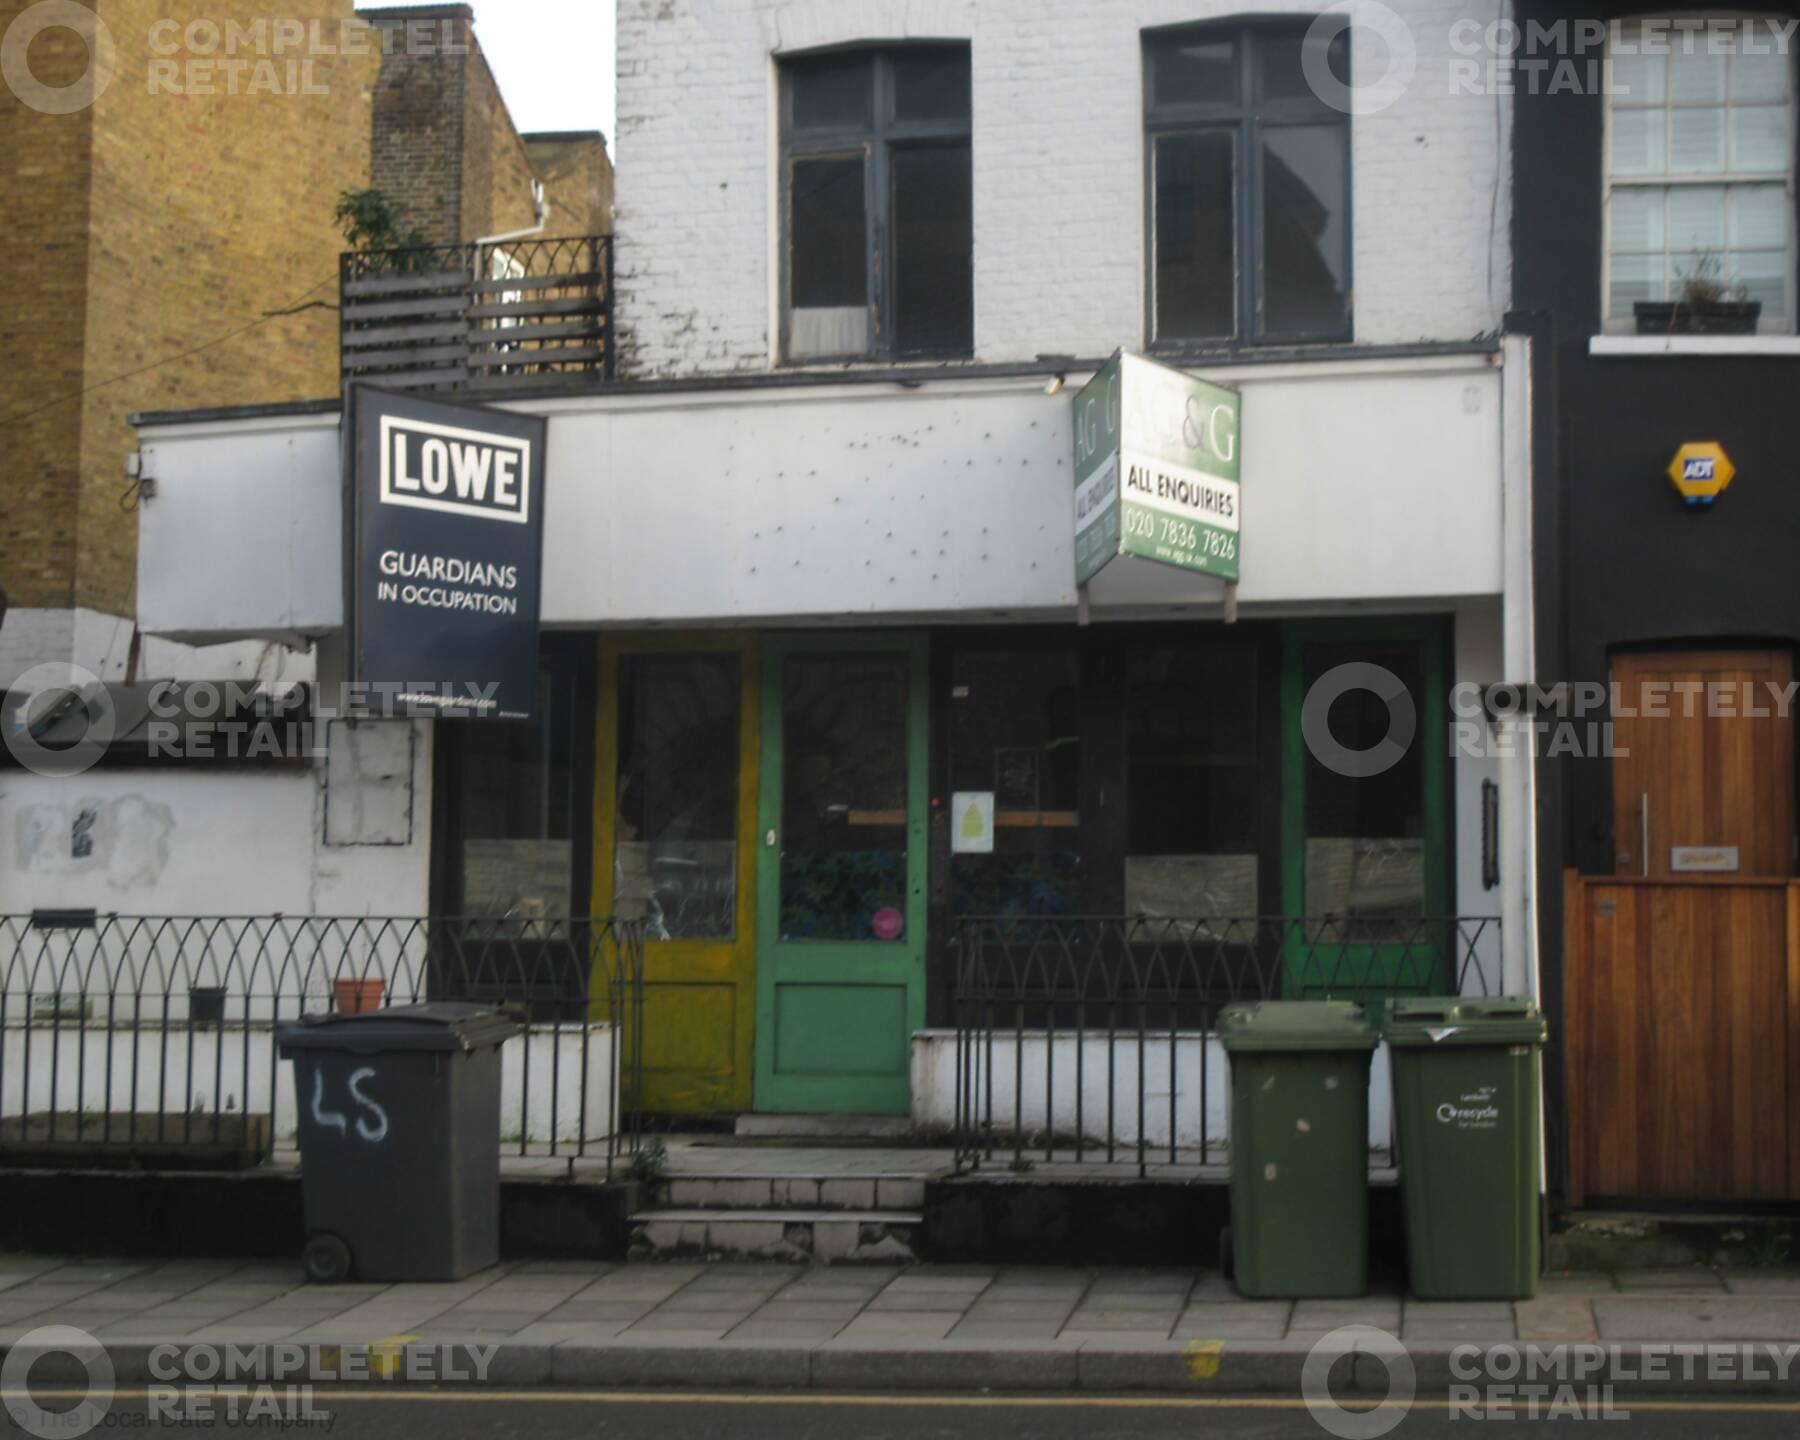 697 Wandsworth Road